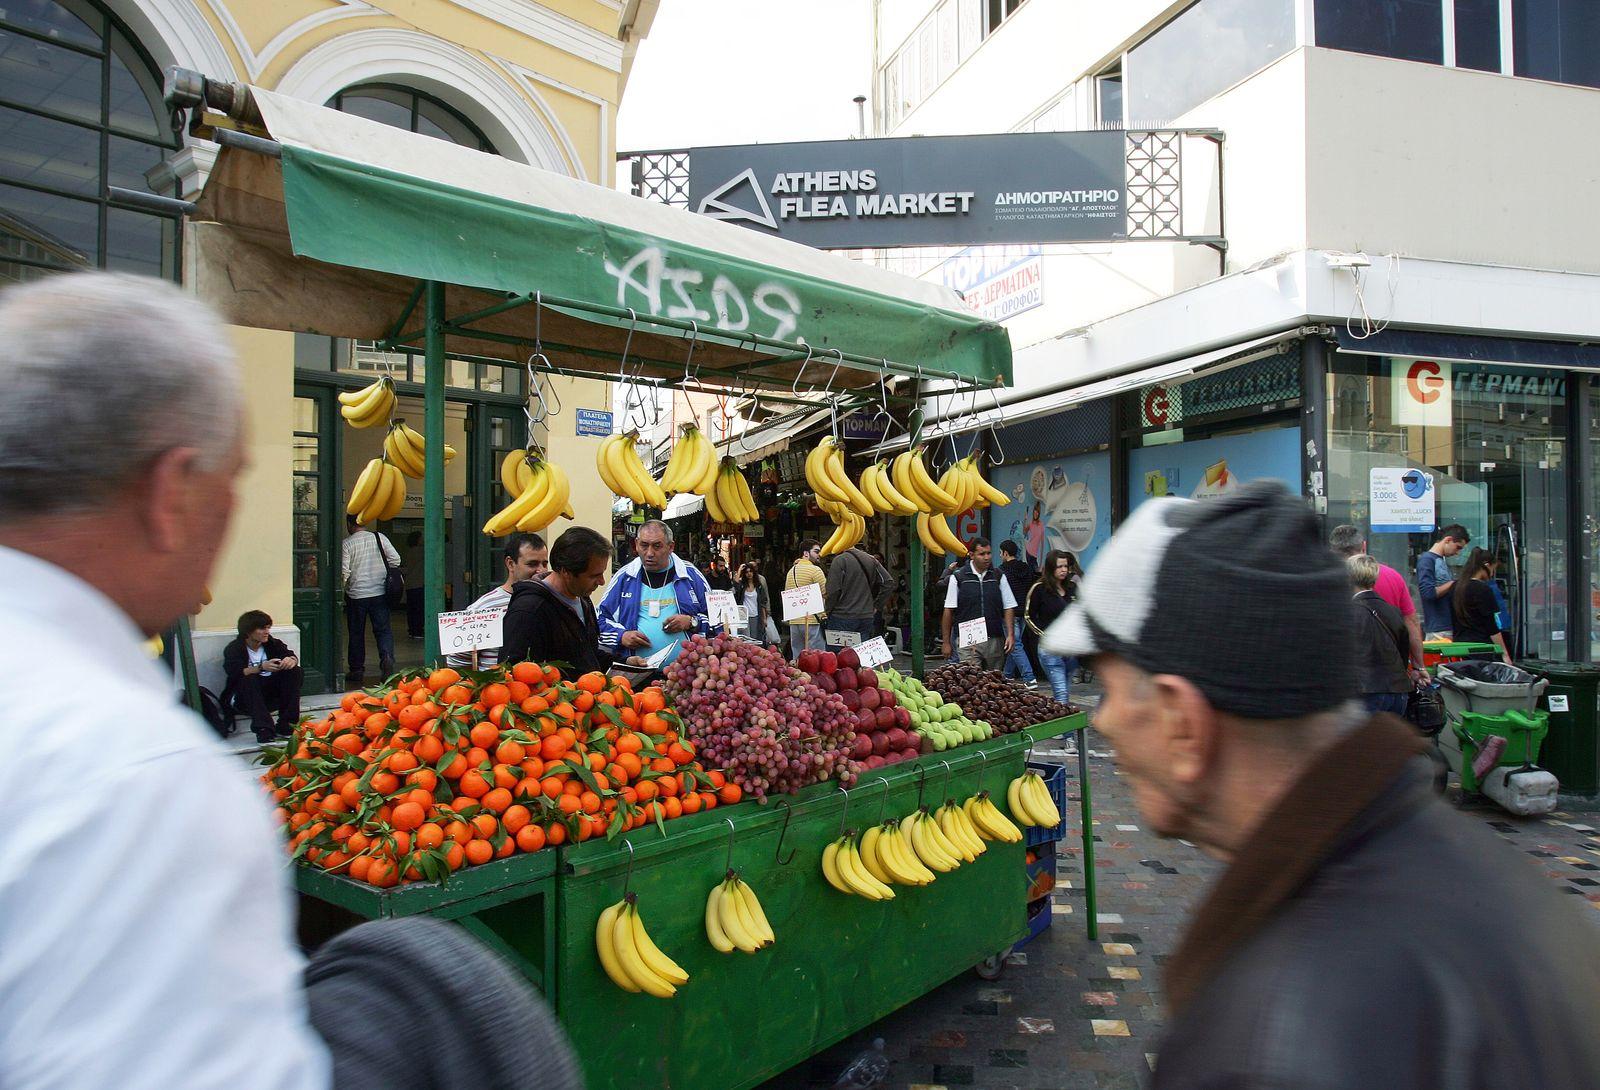 Griechenland / Markt / Gemüse / Obst